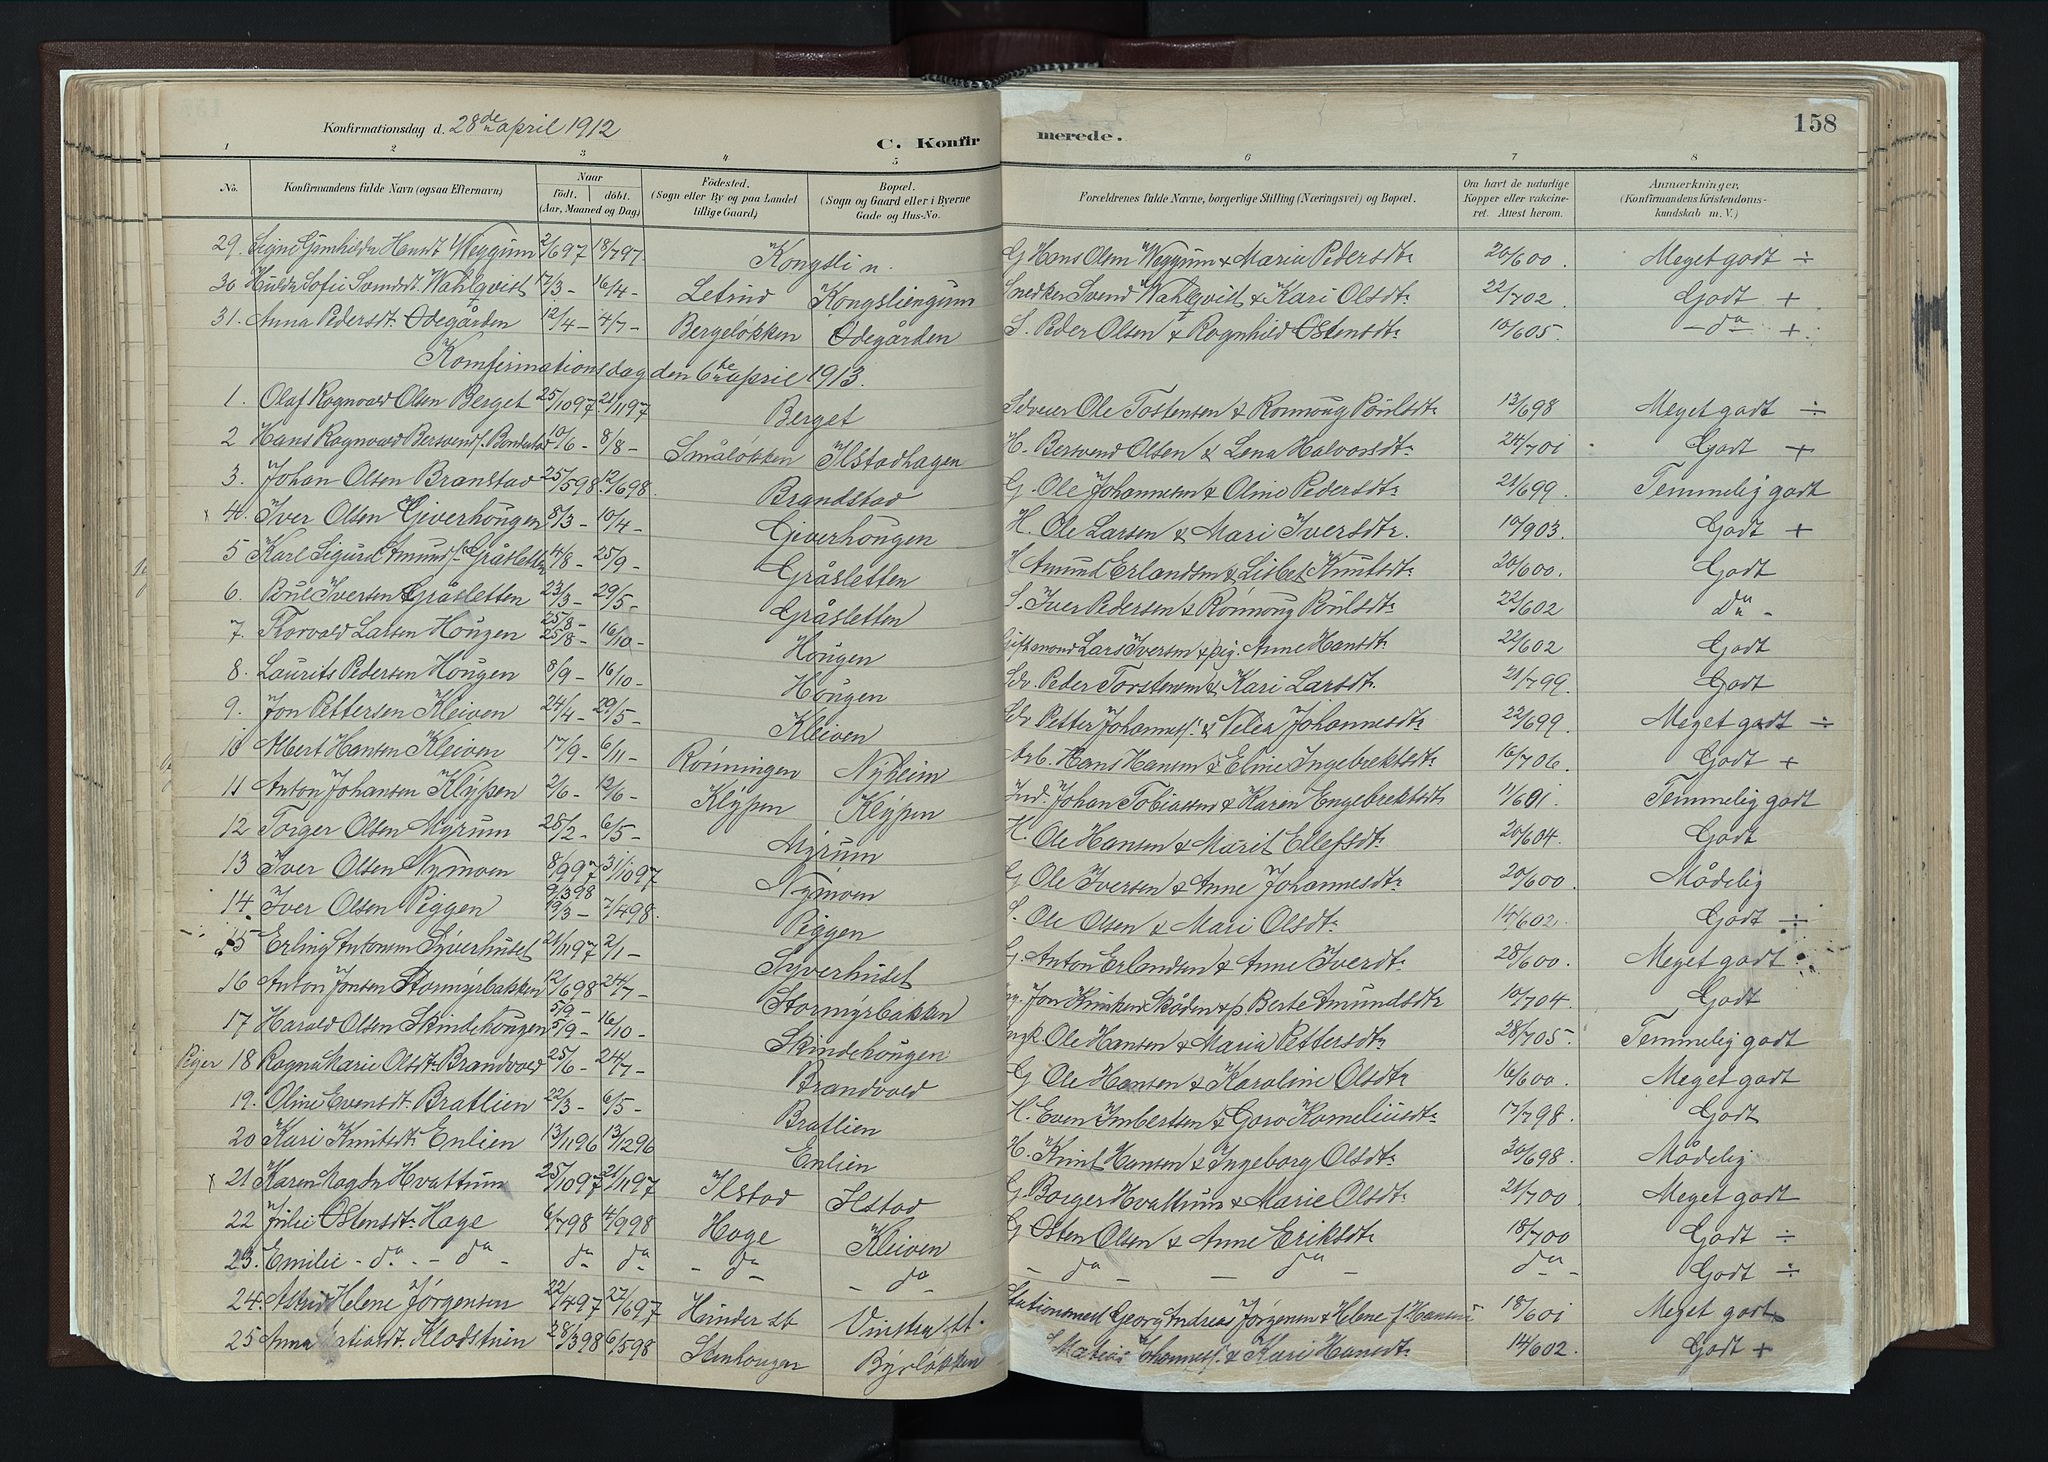 SAH, Nord-Fron prestekontor, Ministerialbok nr. 4, 1884-1914, s. 158